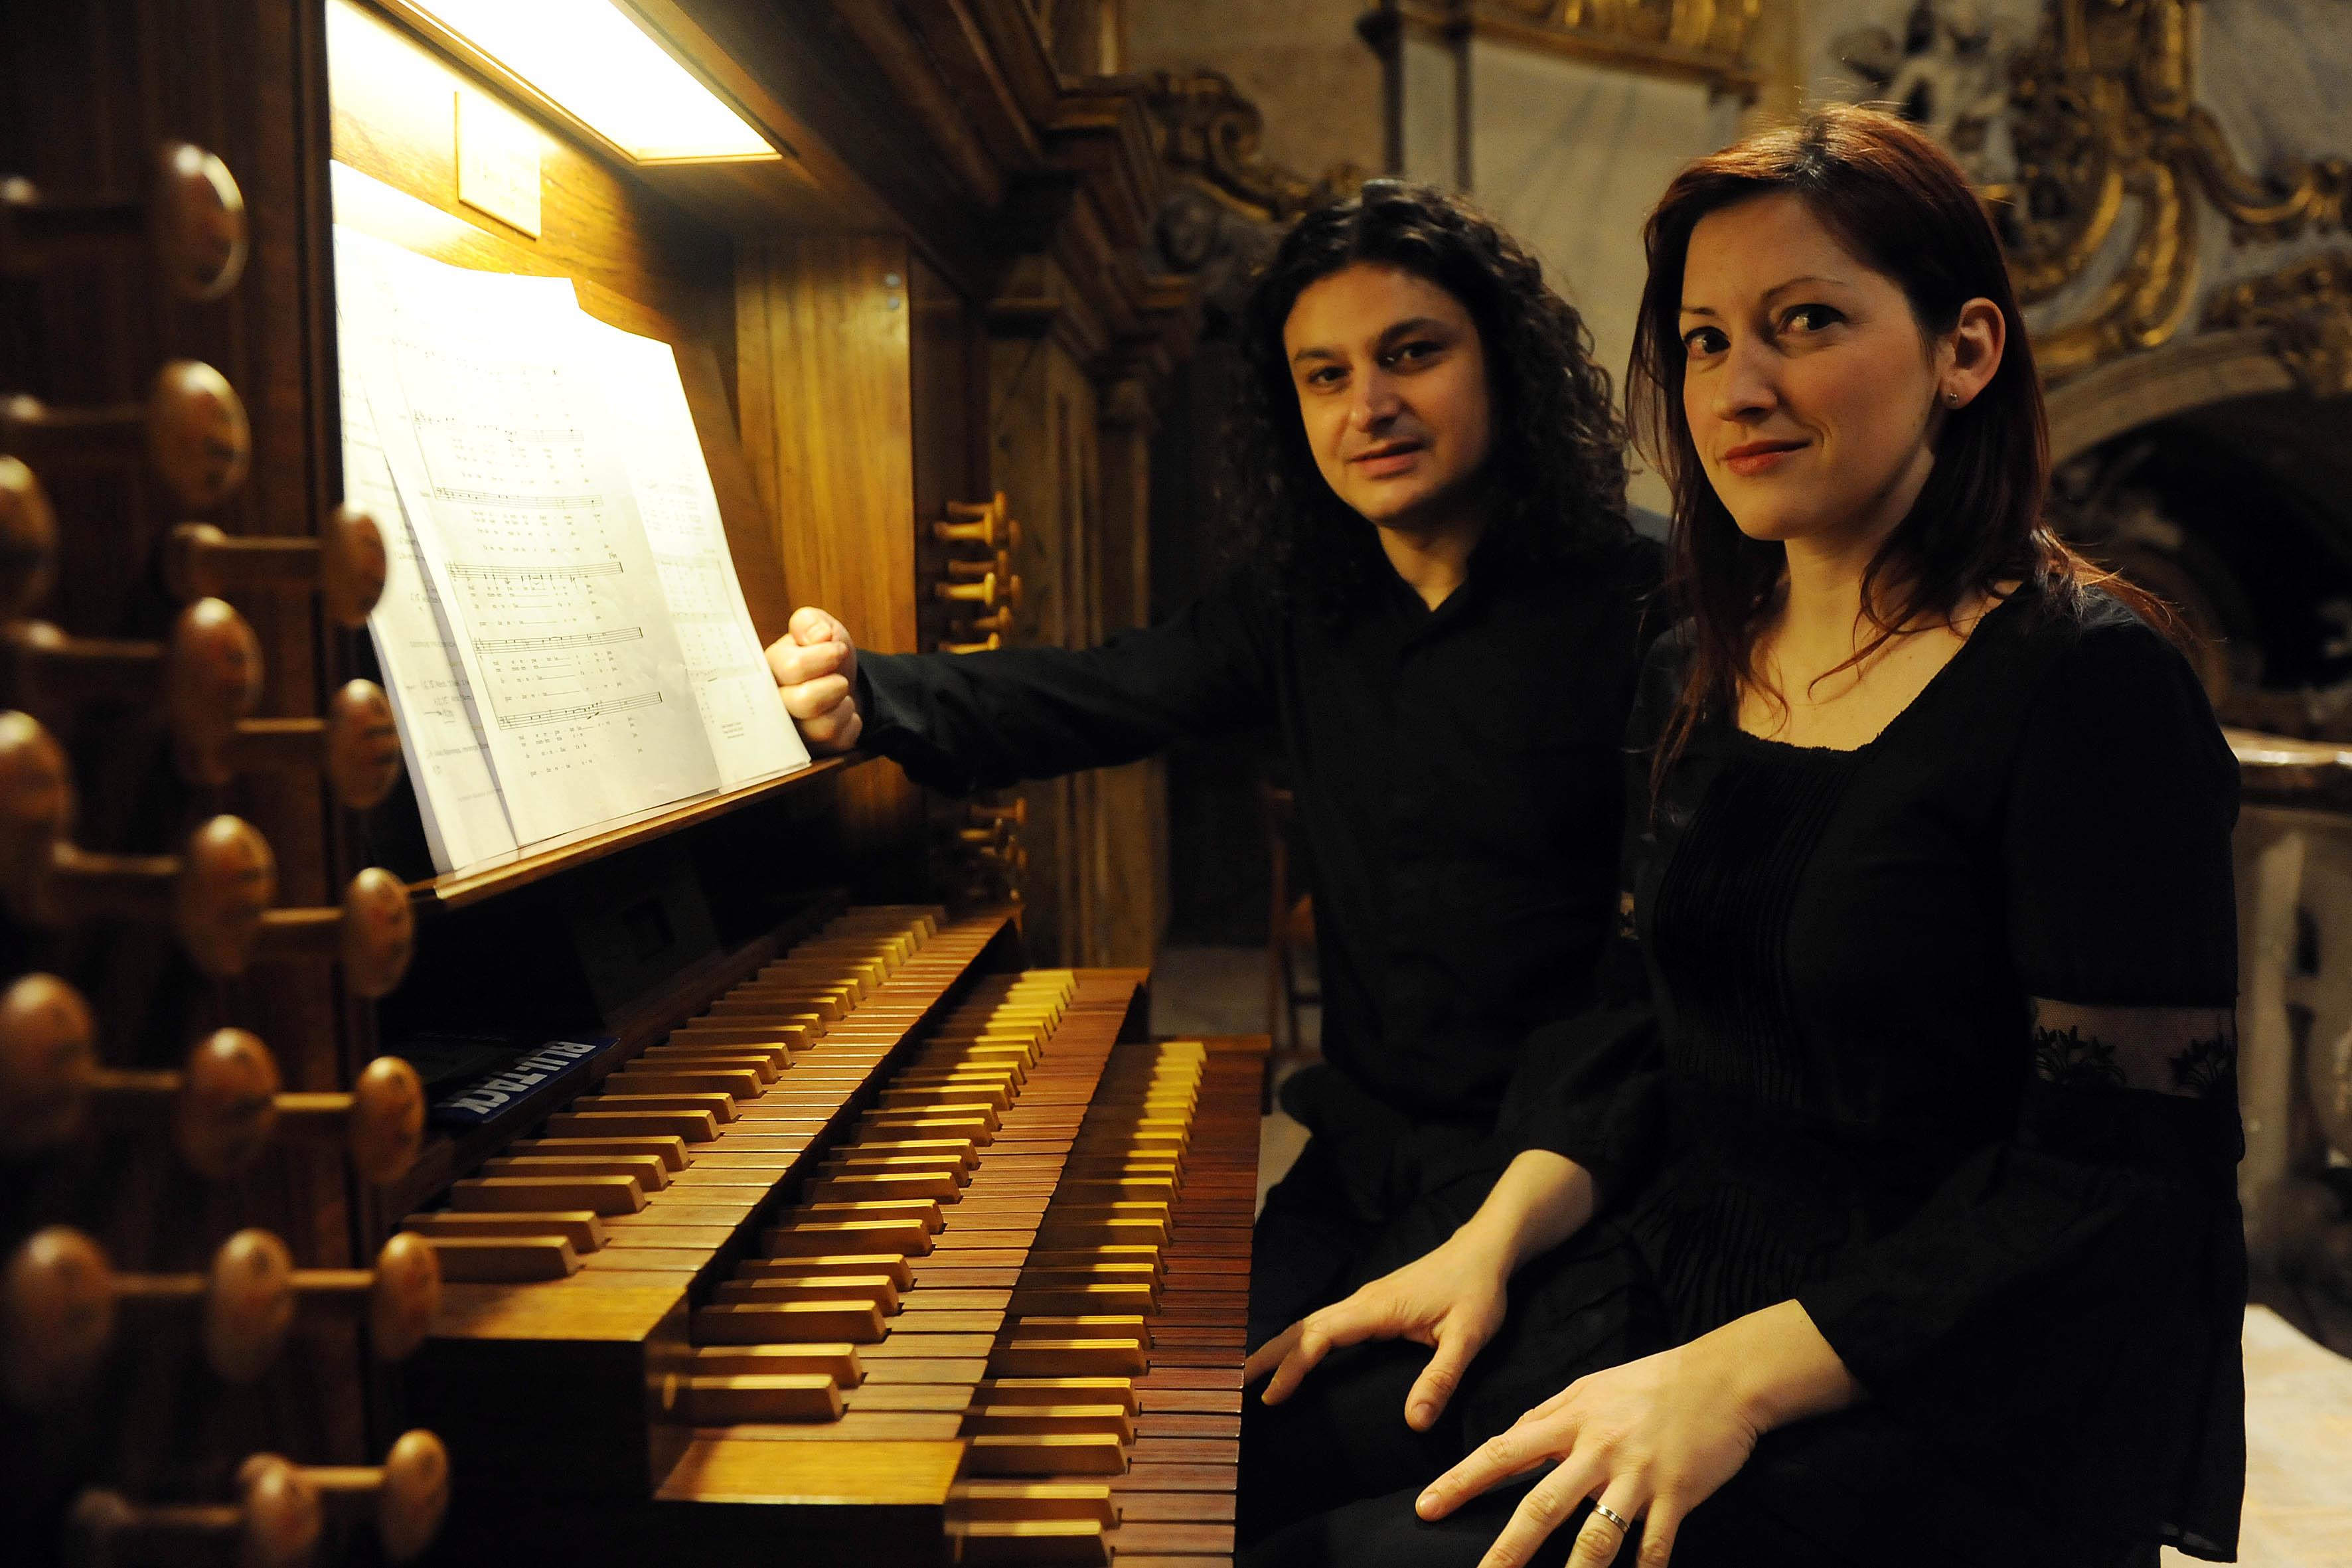 Recital de canto y órgano. XXl Festival de Arte Sacro de Madrid